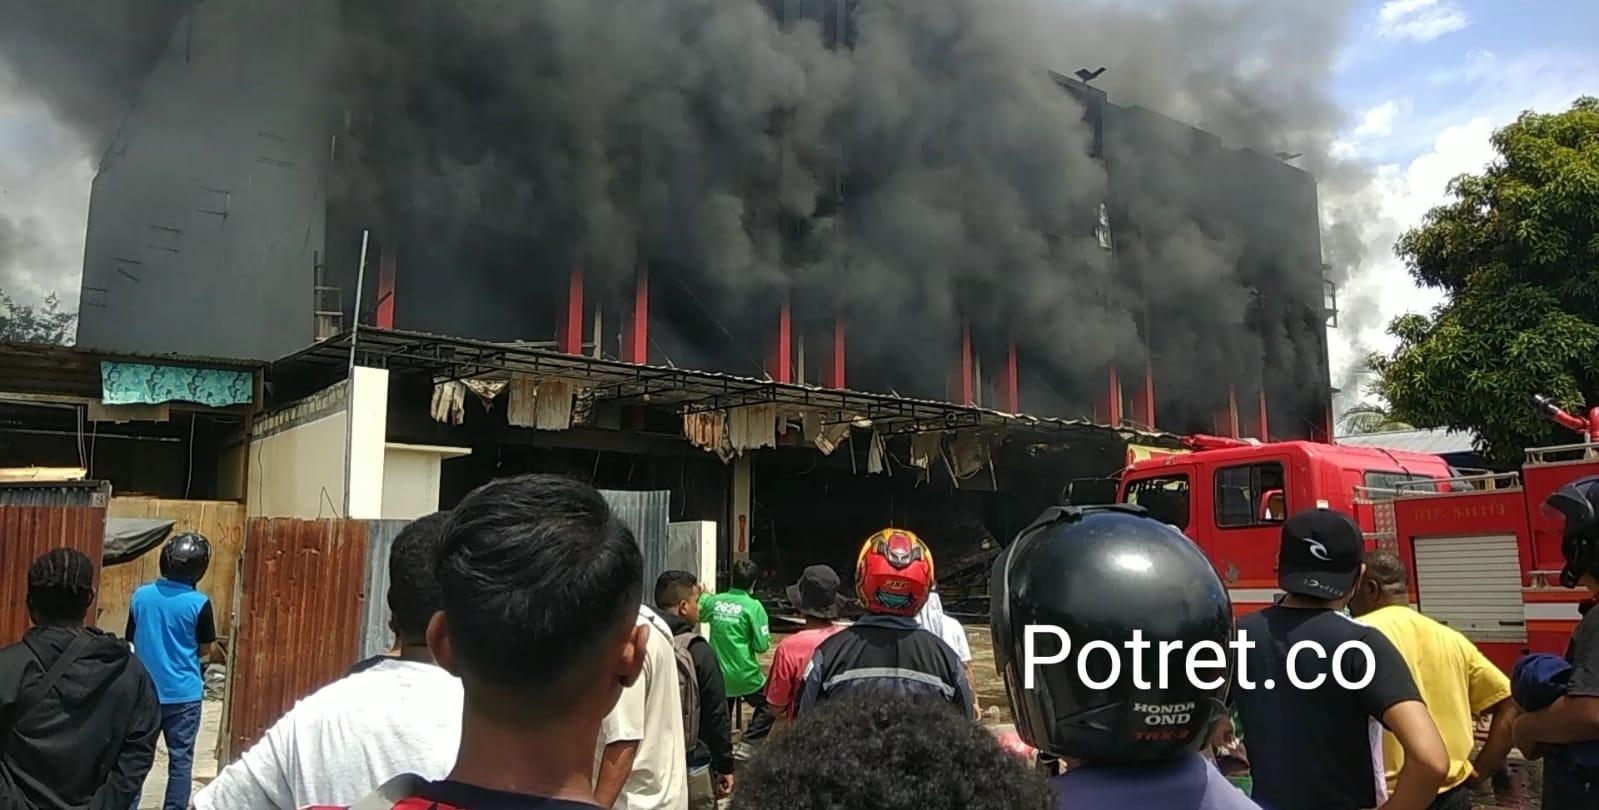 Diduga api cepat merambat ke bangunan lain lantaran banyak barang yang mudah terbakar. Bidang Pemadam Kebakaran Kota Jayapura menerjunkan tujuh unit mobil pemadam kebakaran yakni, empat unit mobil penyemprot dan tiga unit mobil AWC atau supply. Serta satu unit mobil water cannon milik Brimob Polda Papua.